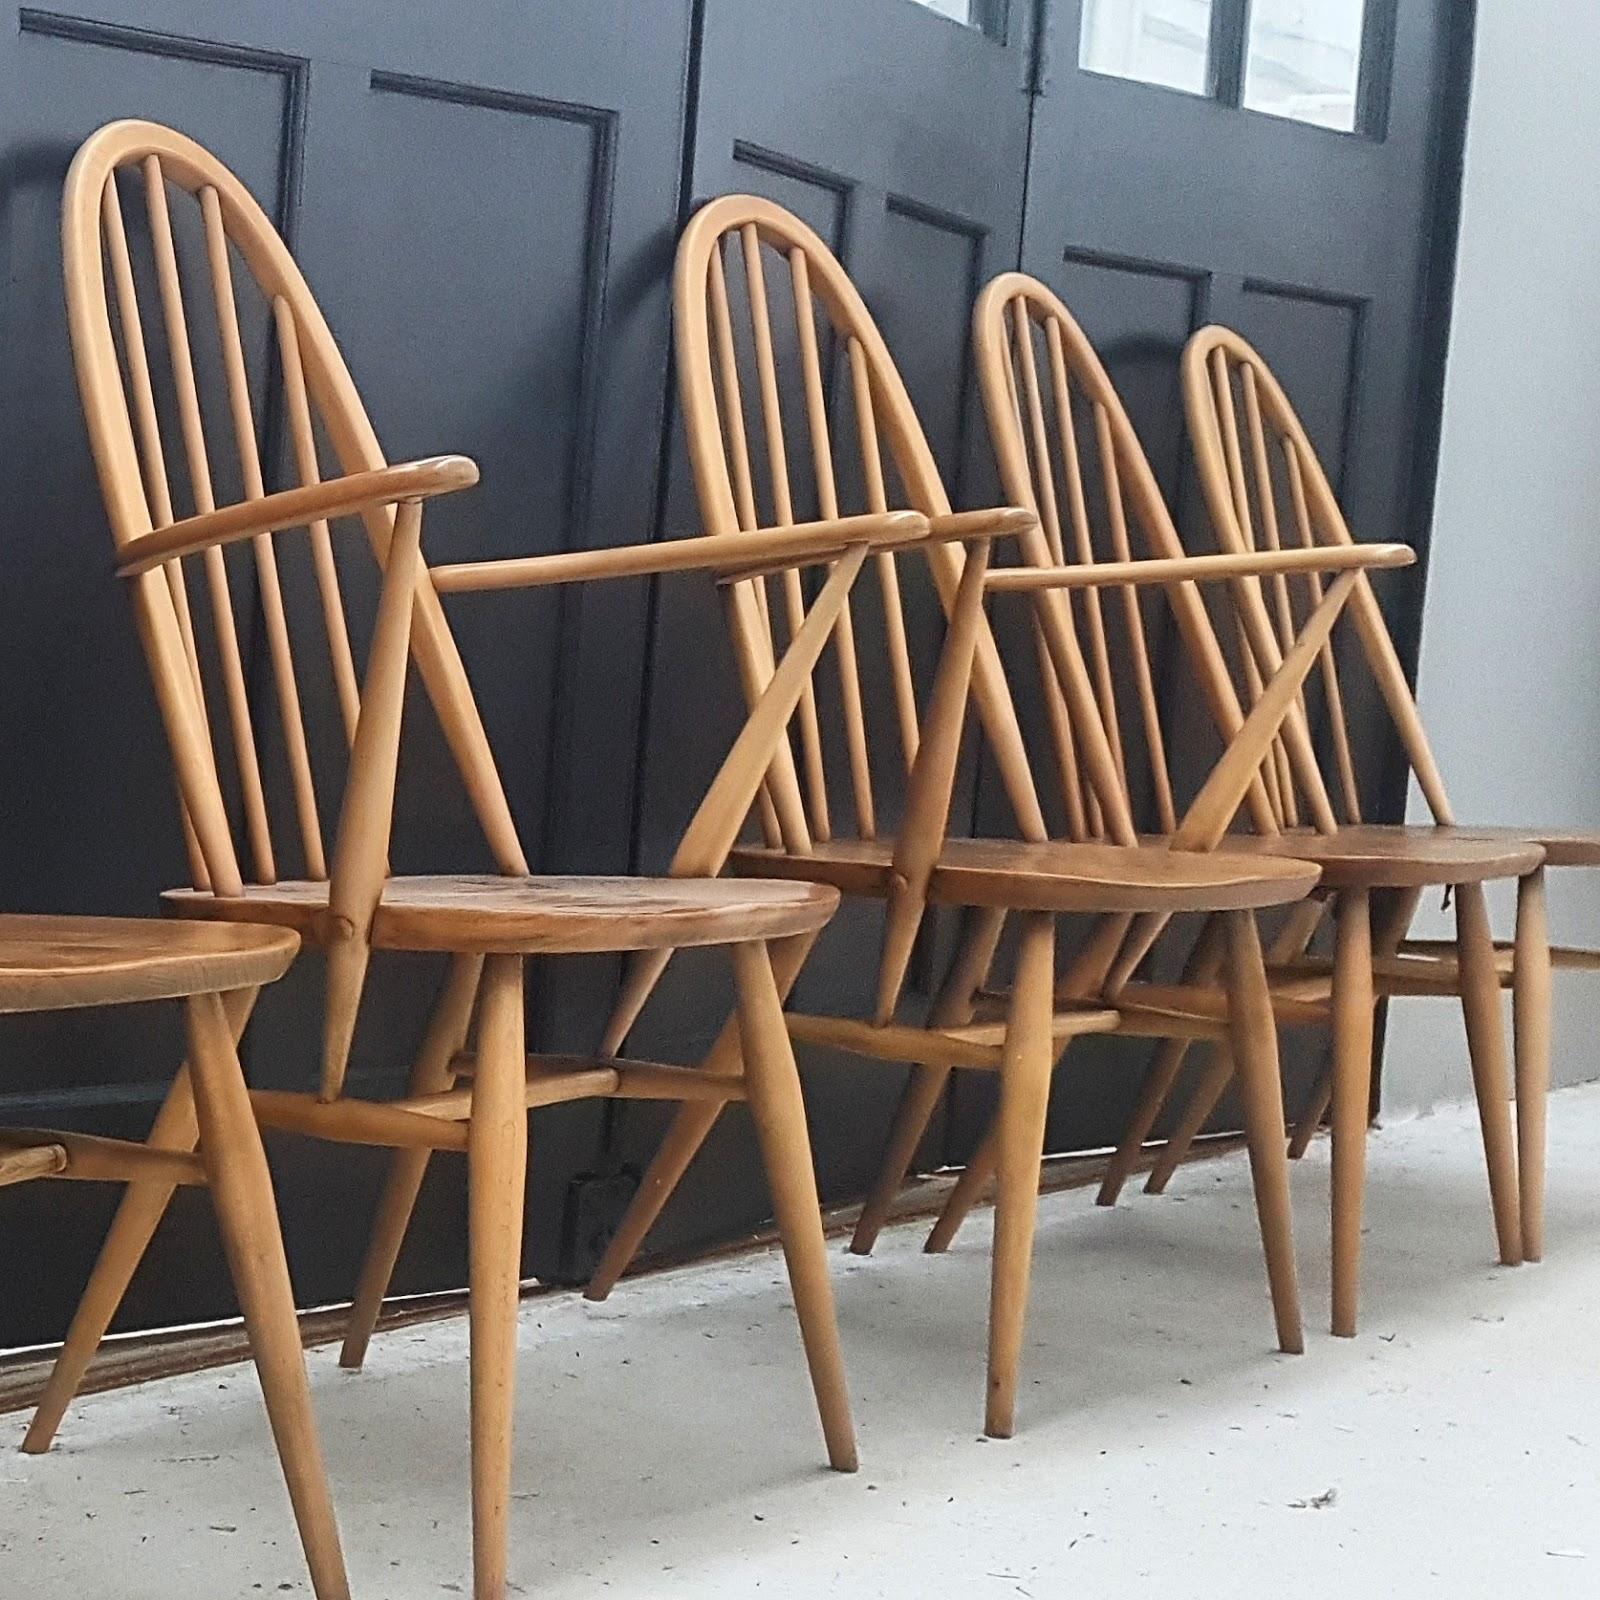 Ashley Furniture Midlothian Va: Mid Century Modern Furniture At Victoria Mill Lancashire